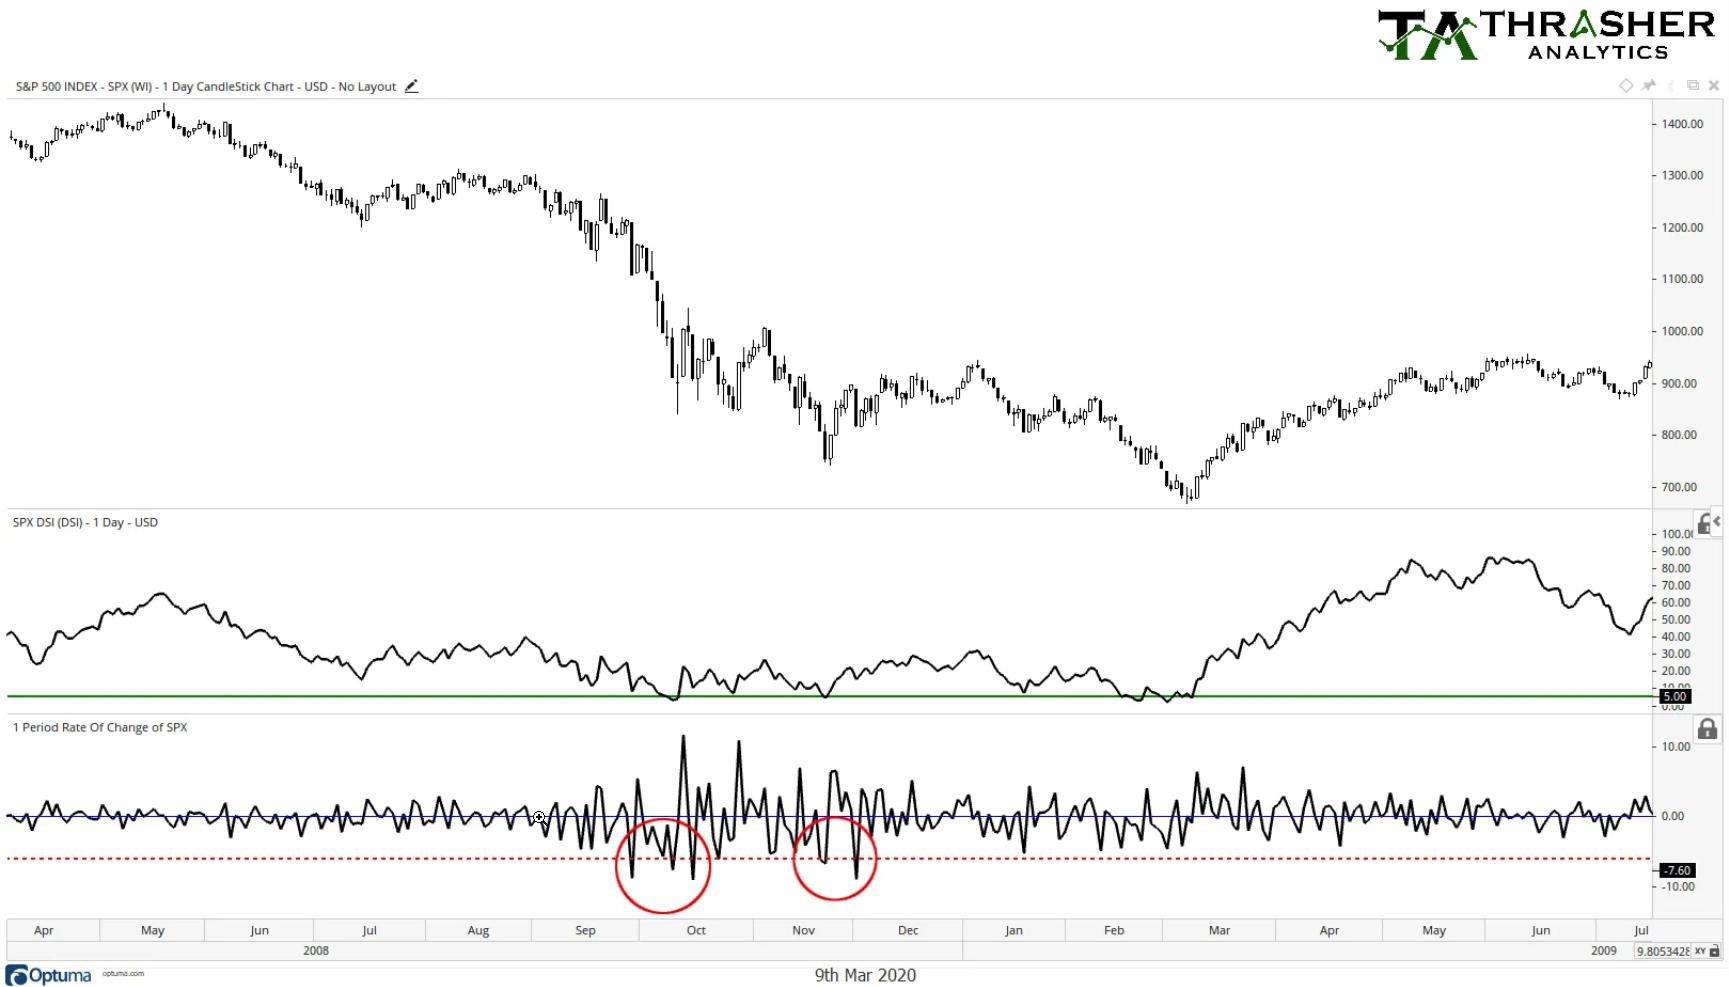 S&P 500: 2008